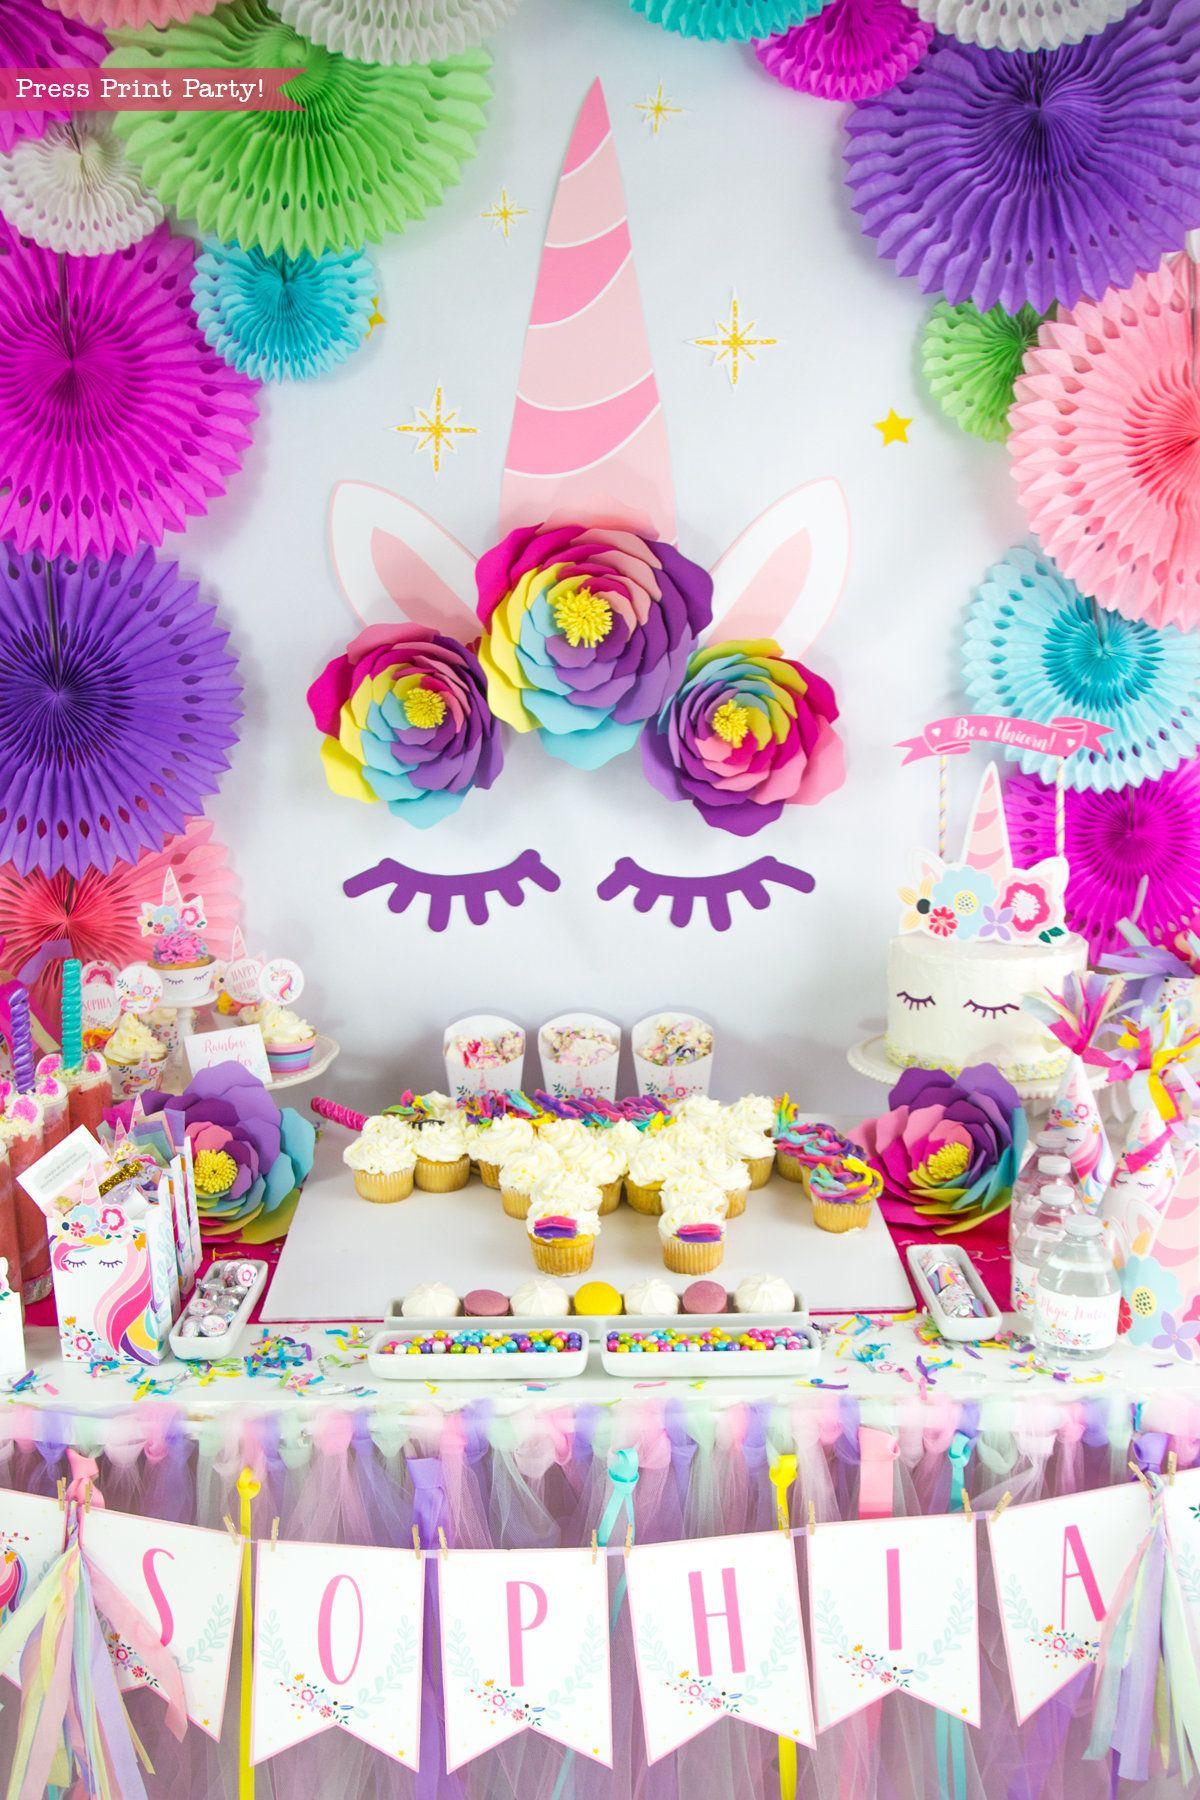 Unicorn Backdrop Printables, Unicorn Party, Giant Unicorn Horn and Ears, Sleepy Eyes, Unicorn Birthday, Unicorn Decor, INSTANT DOWNLOAD